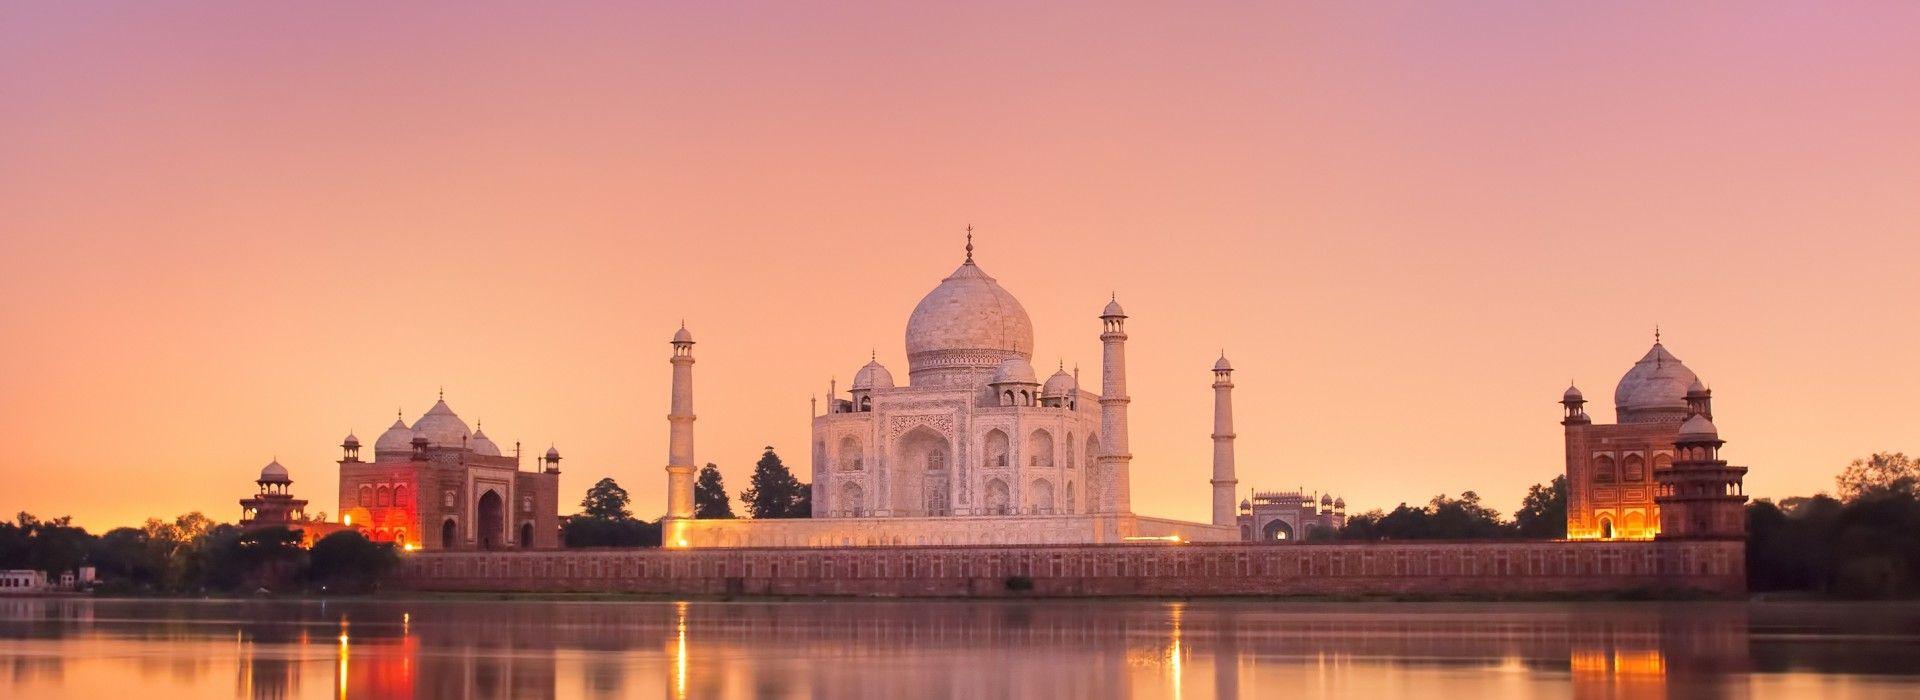 Natural landmarks sightseeing Tours in India